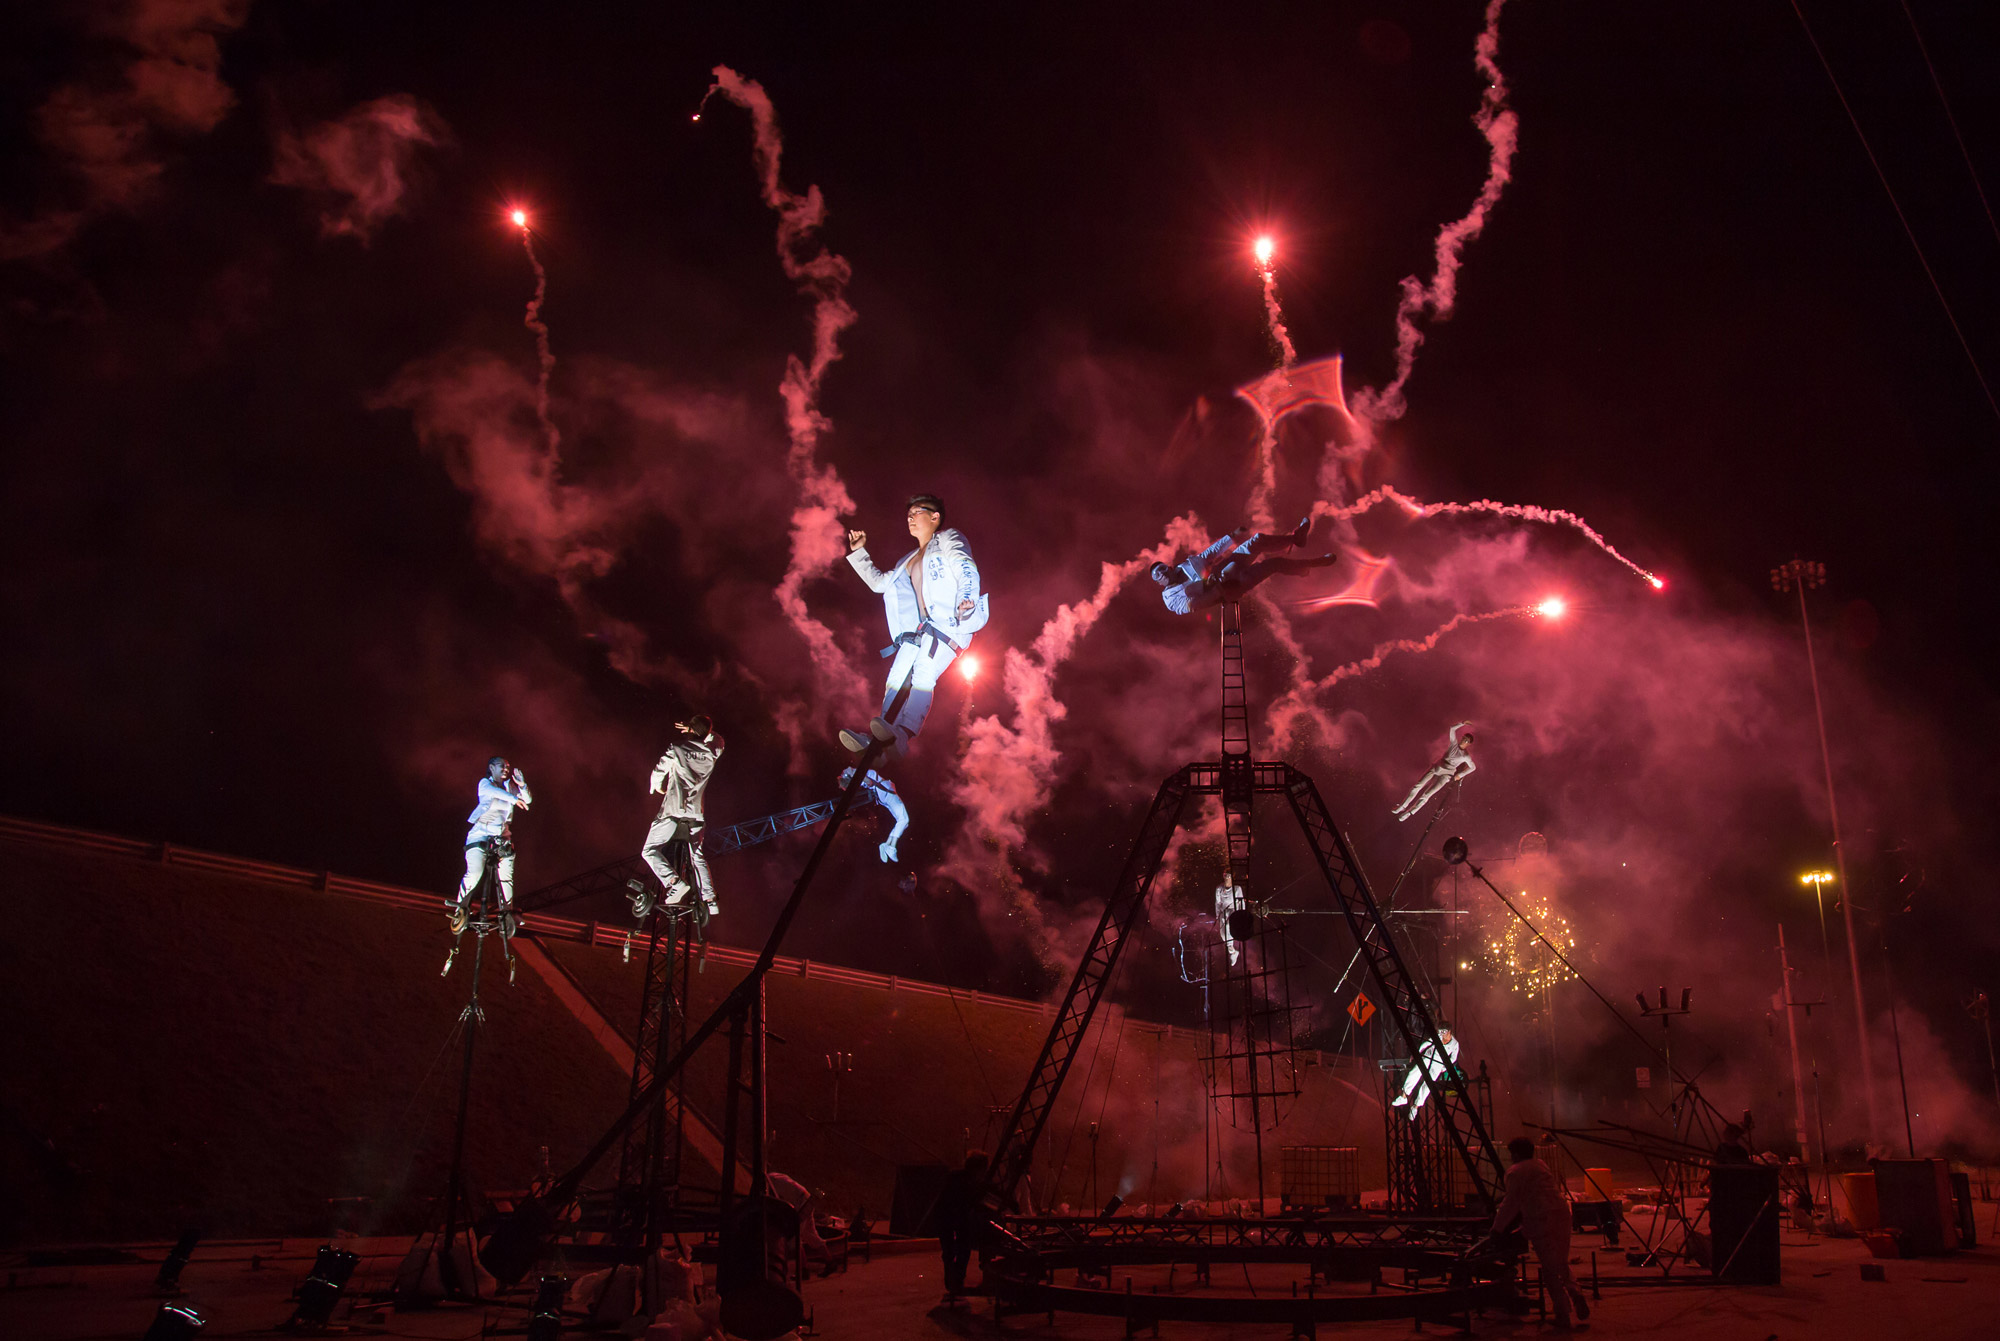 Festival del Desierto, Matehuala, Mexico, PAN.OPTIKUM, human factor, Matthias Rettner, Sigrun Fritsch